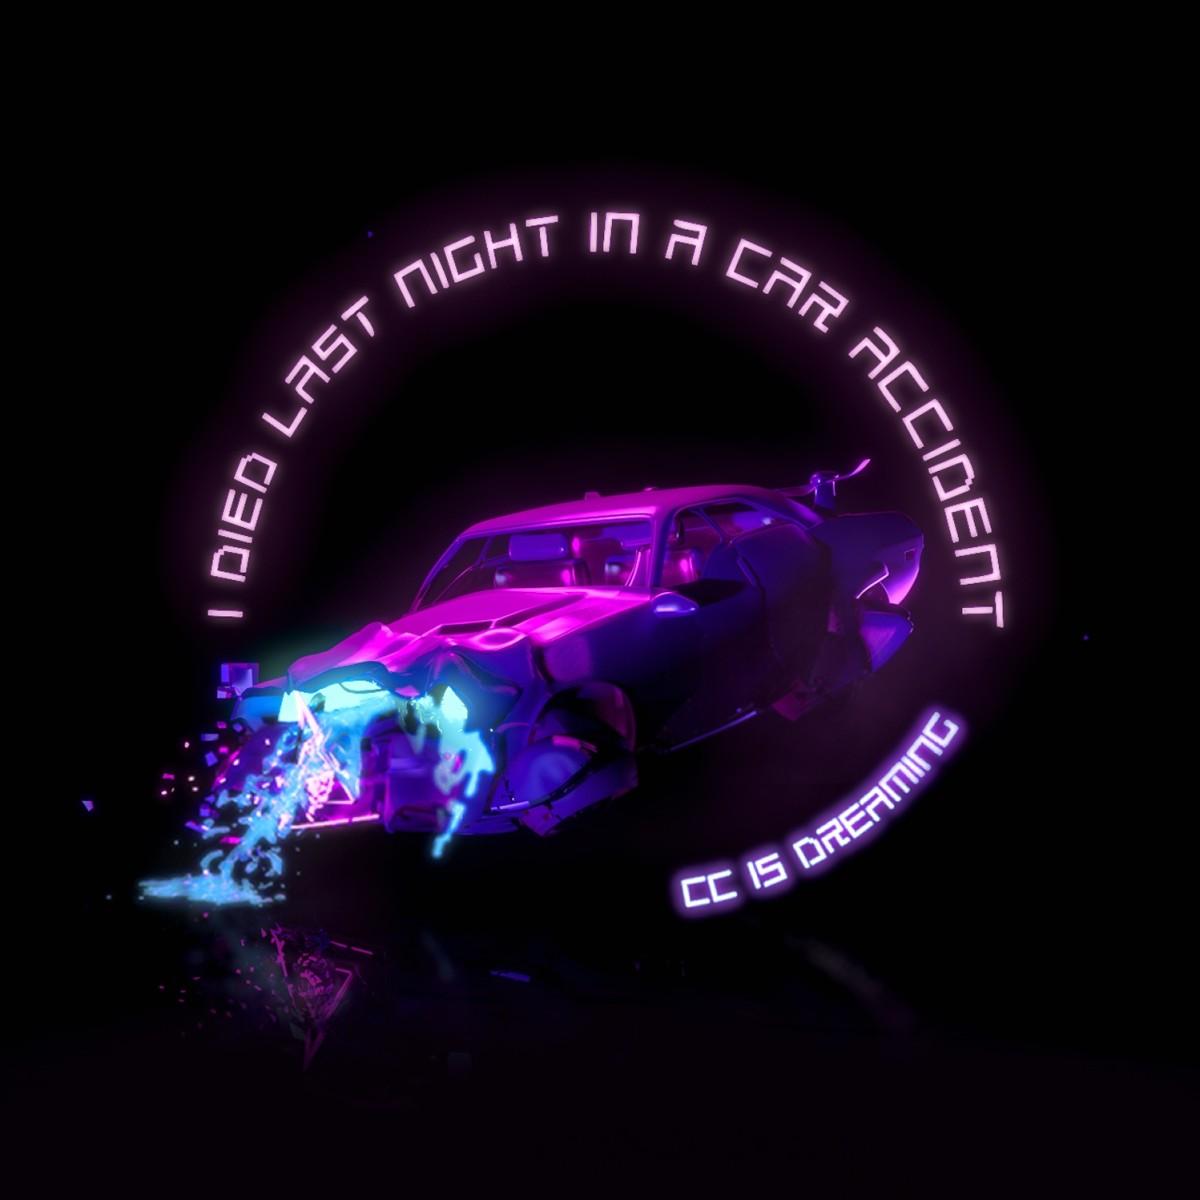 CC is Dreaming - IDiedLastNightInACarAccident